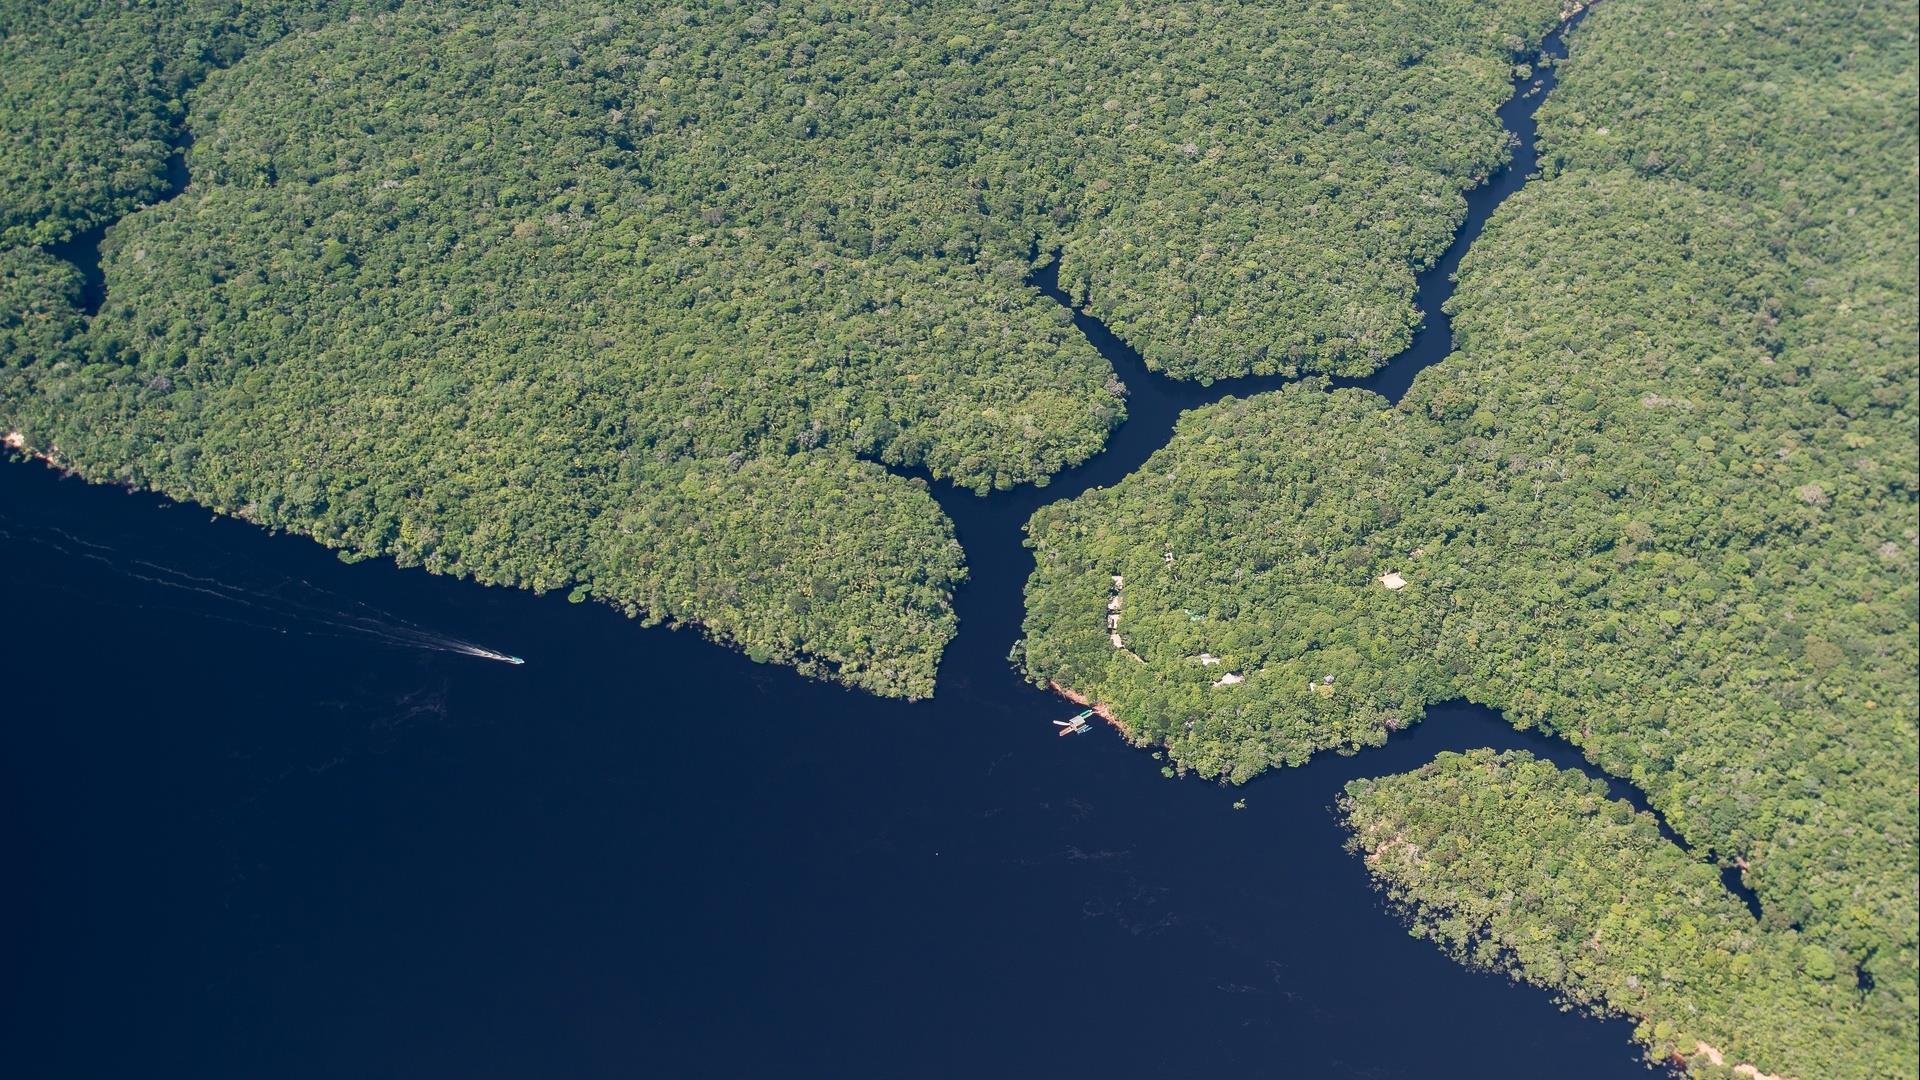 Brasilien Amazonas: 3 Tage Reisebaustein - Anavilhanas Jungle Lodge